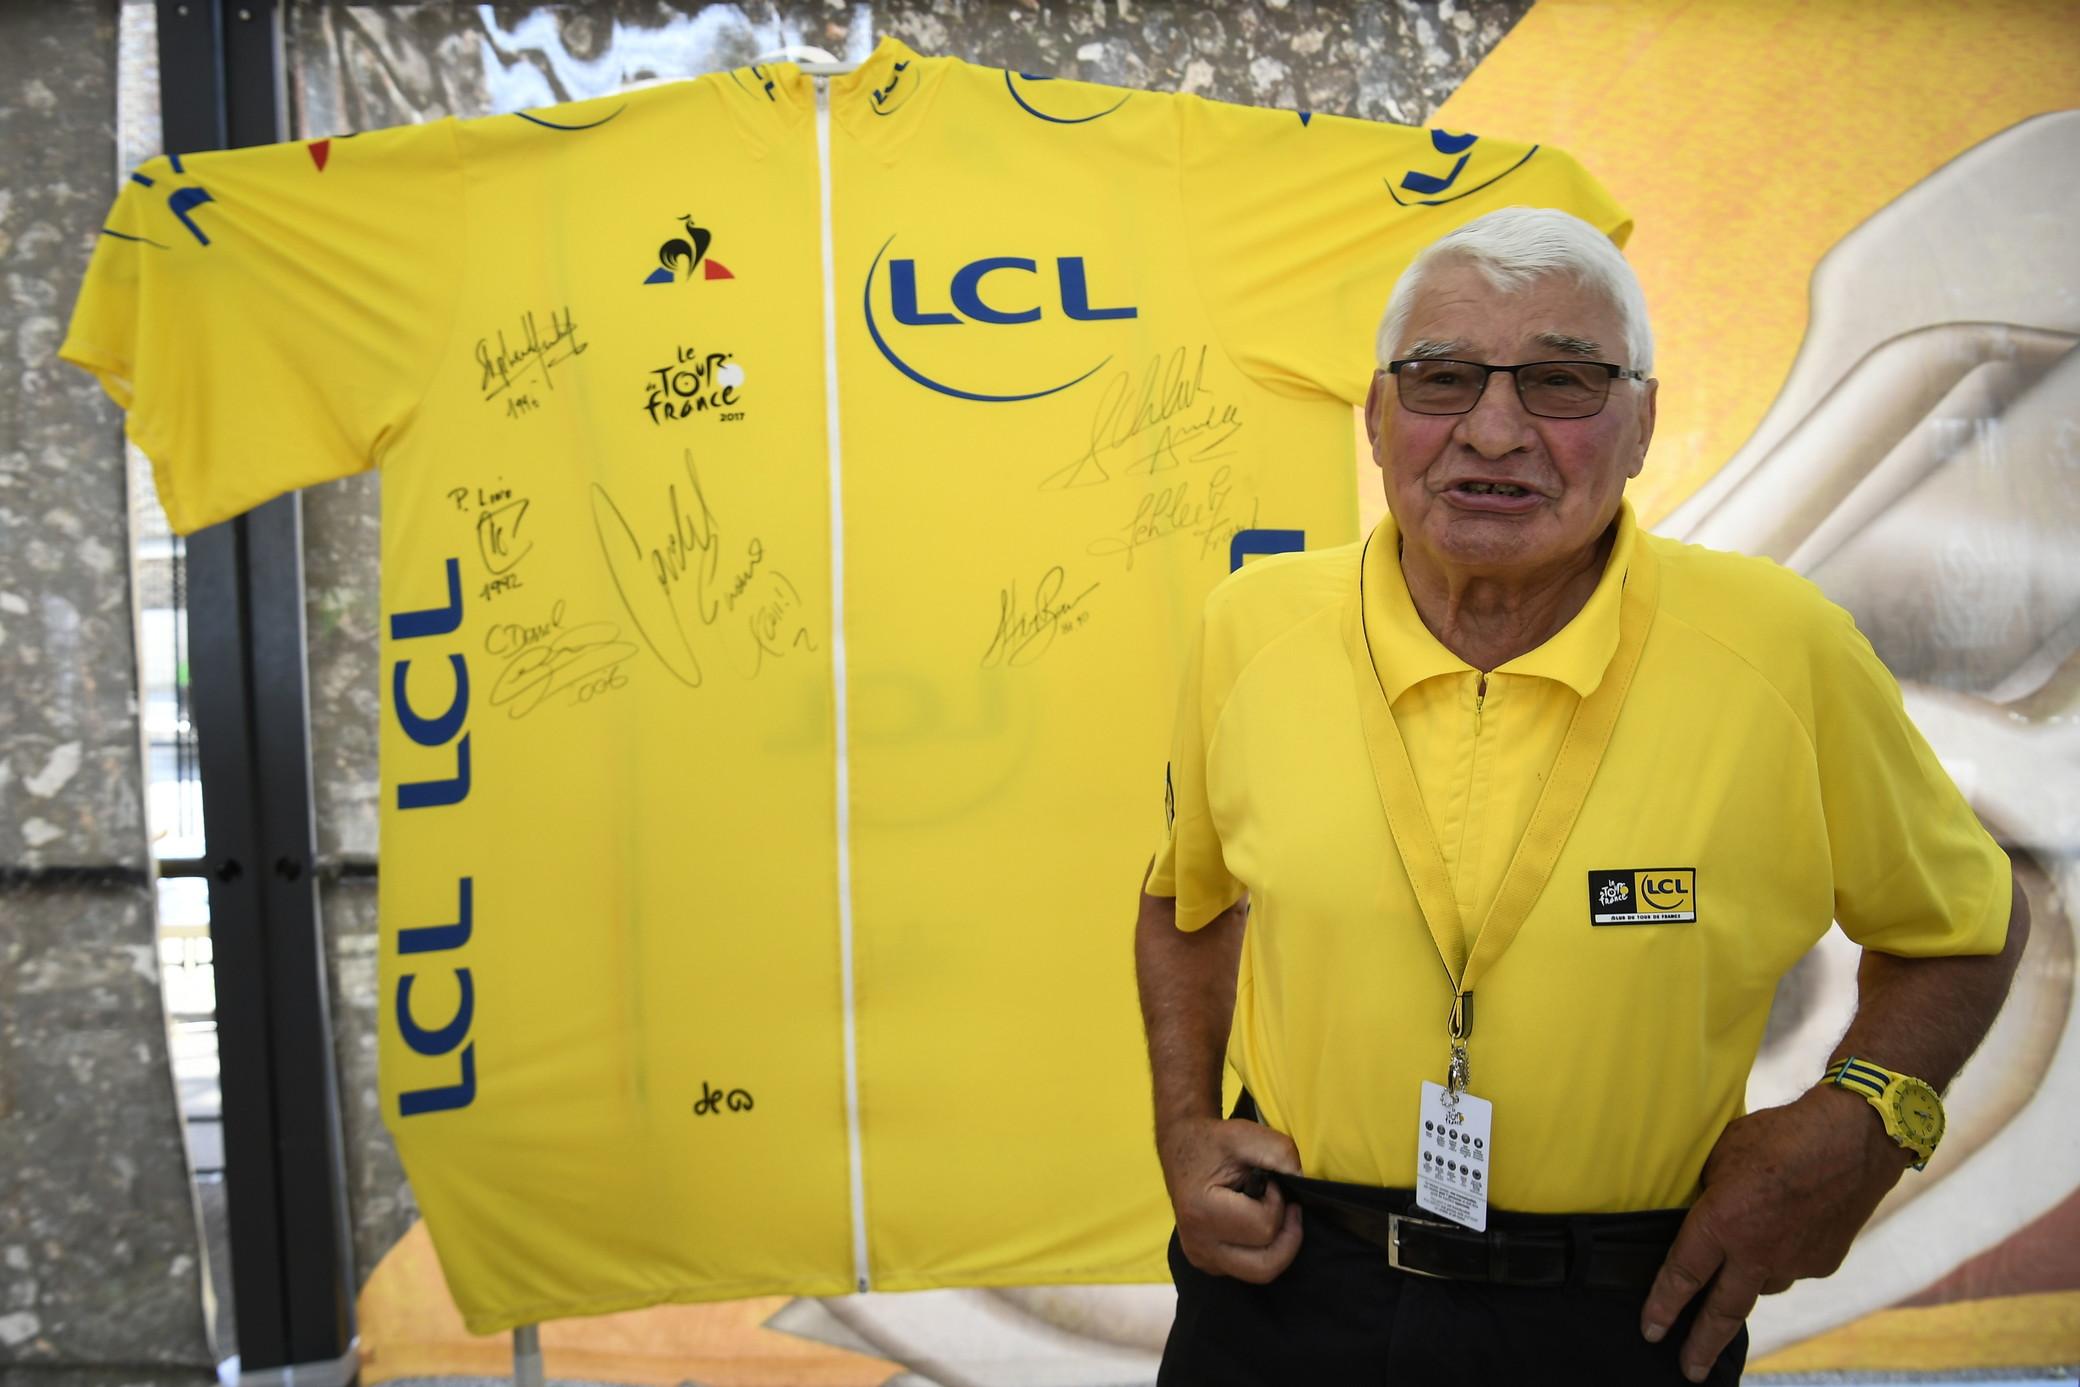 13 novembre: Raymond Poulidor, ex ciclista francese (83 anni)